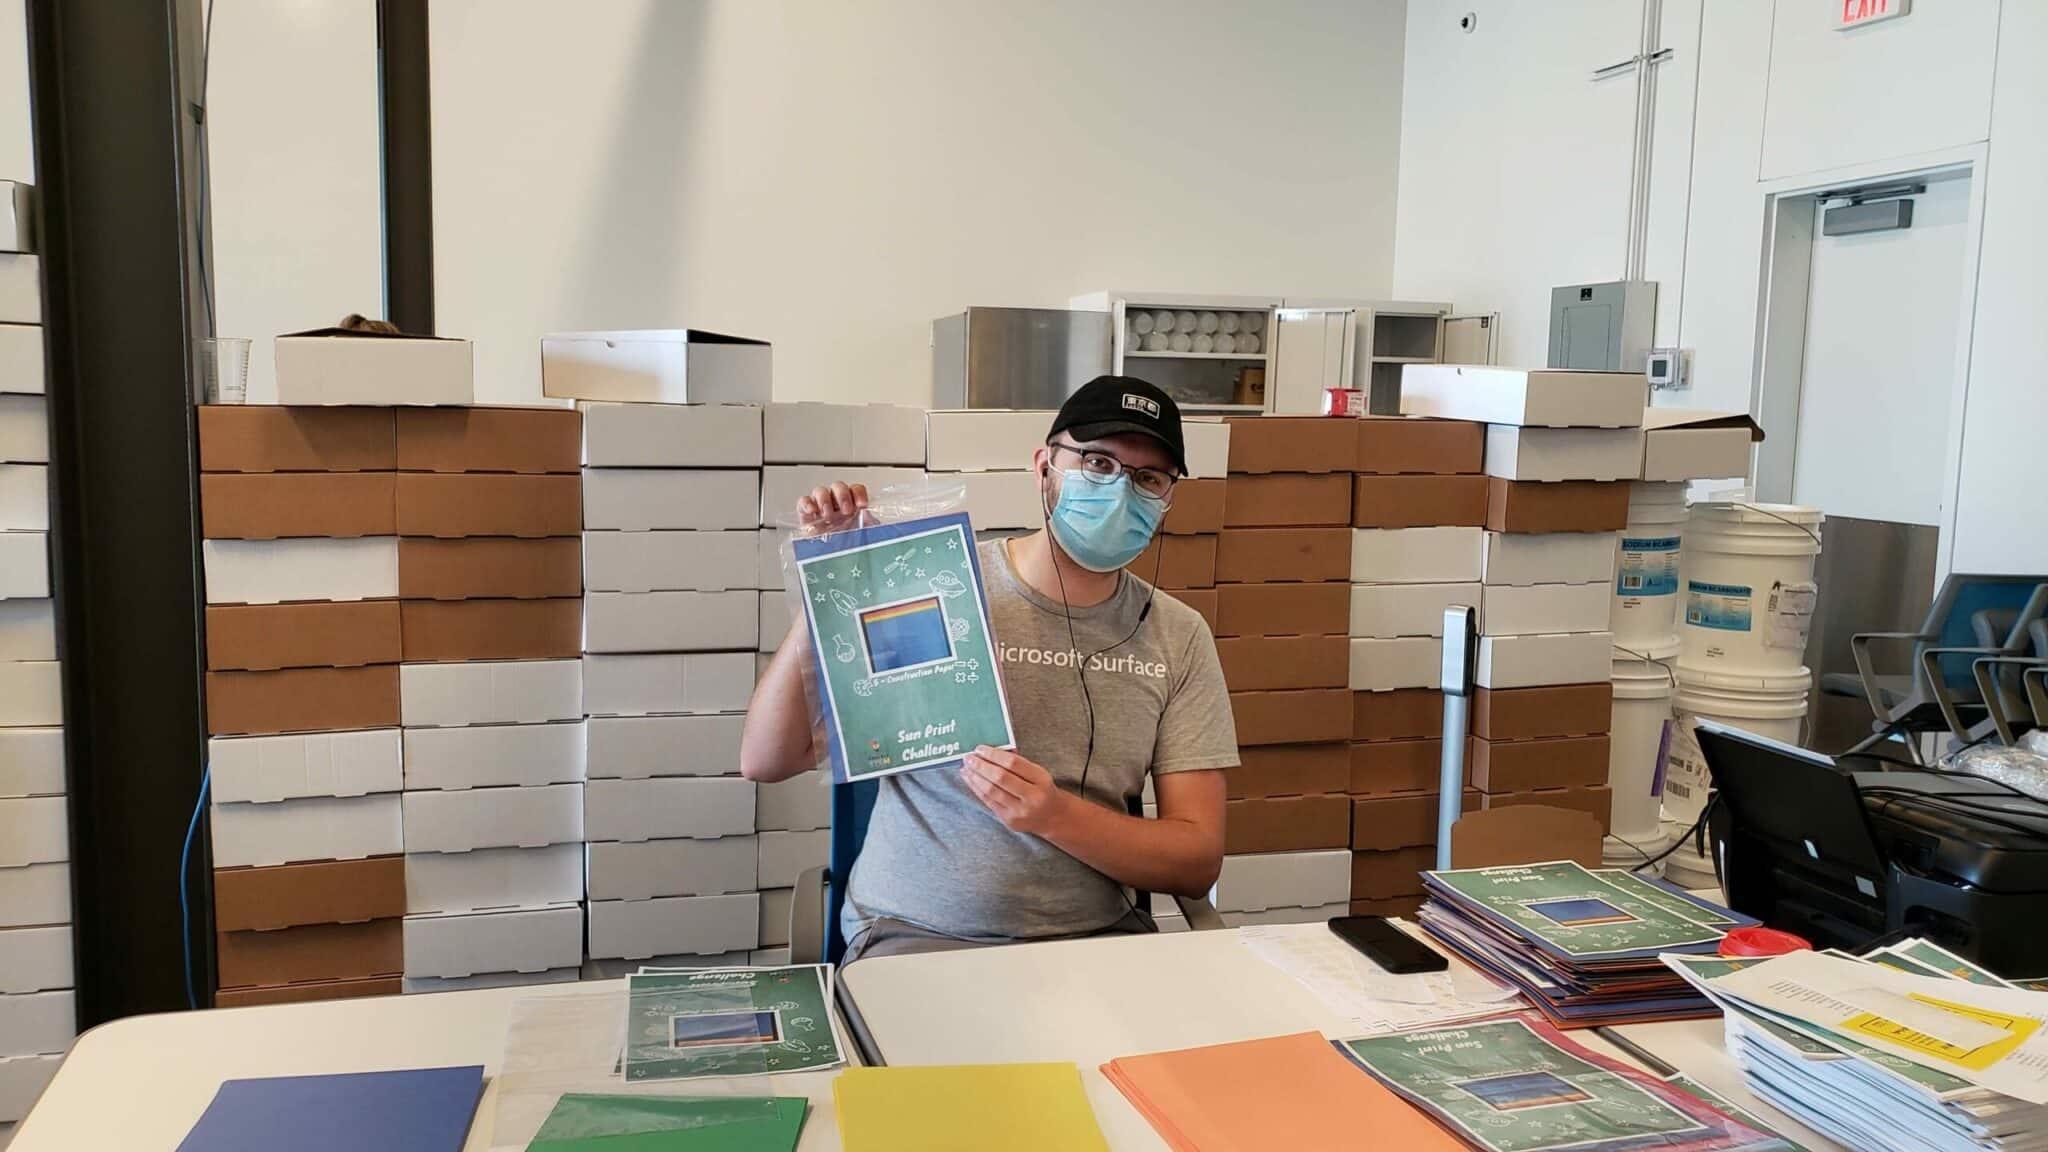 STEAM Kits - Michael Making Sun Print